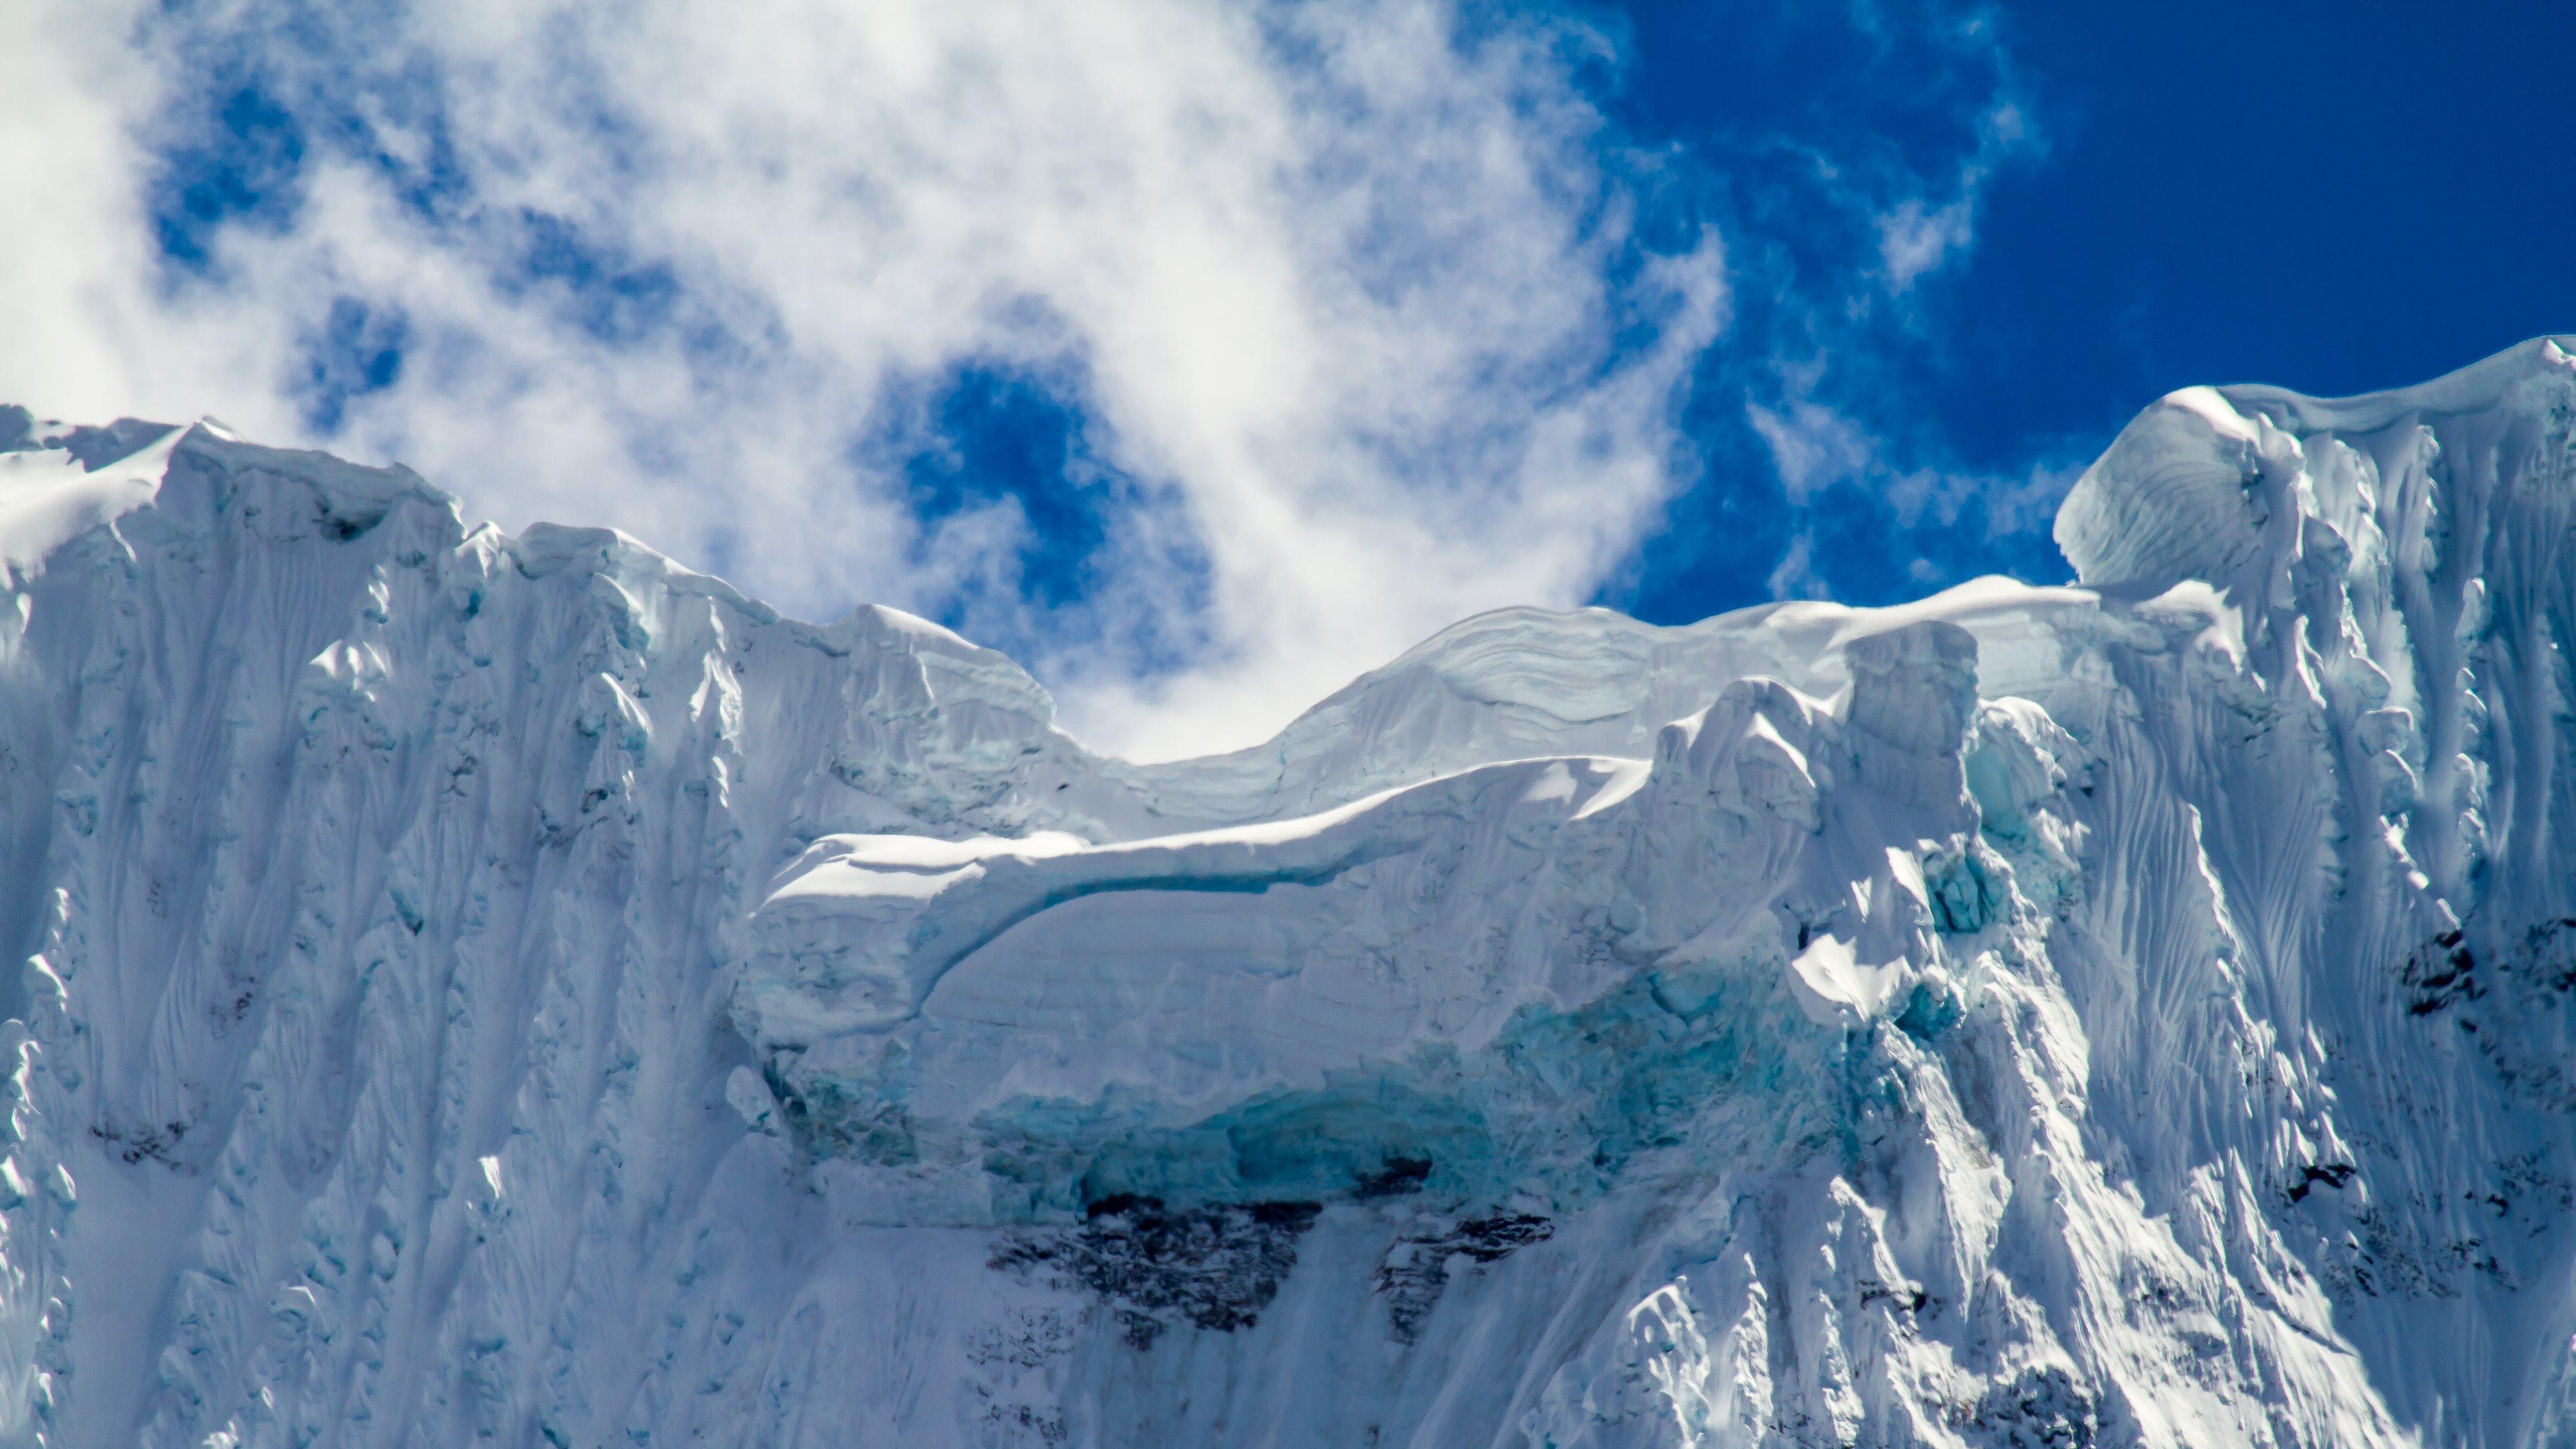 Mountain 4k ultra hd wallpaper background image 3840x2160 id 473254 wallpaper abyss - Ultra 4k background images ...